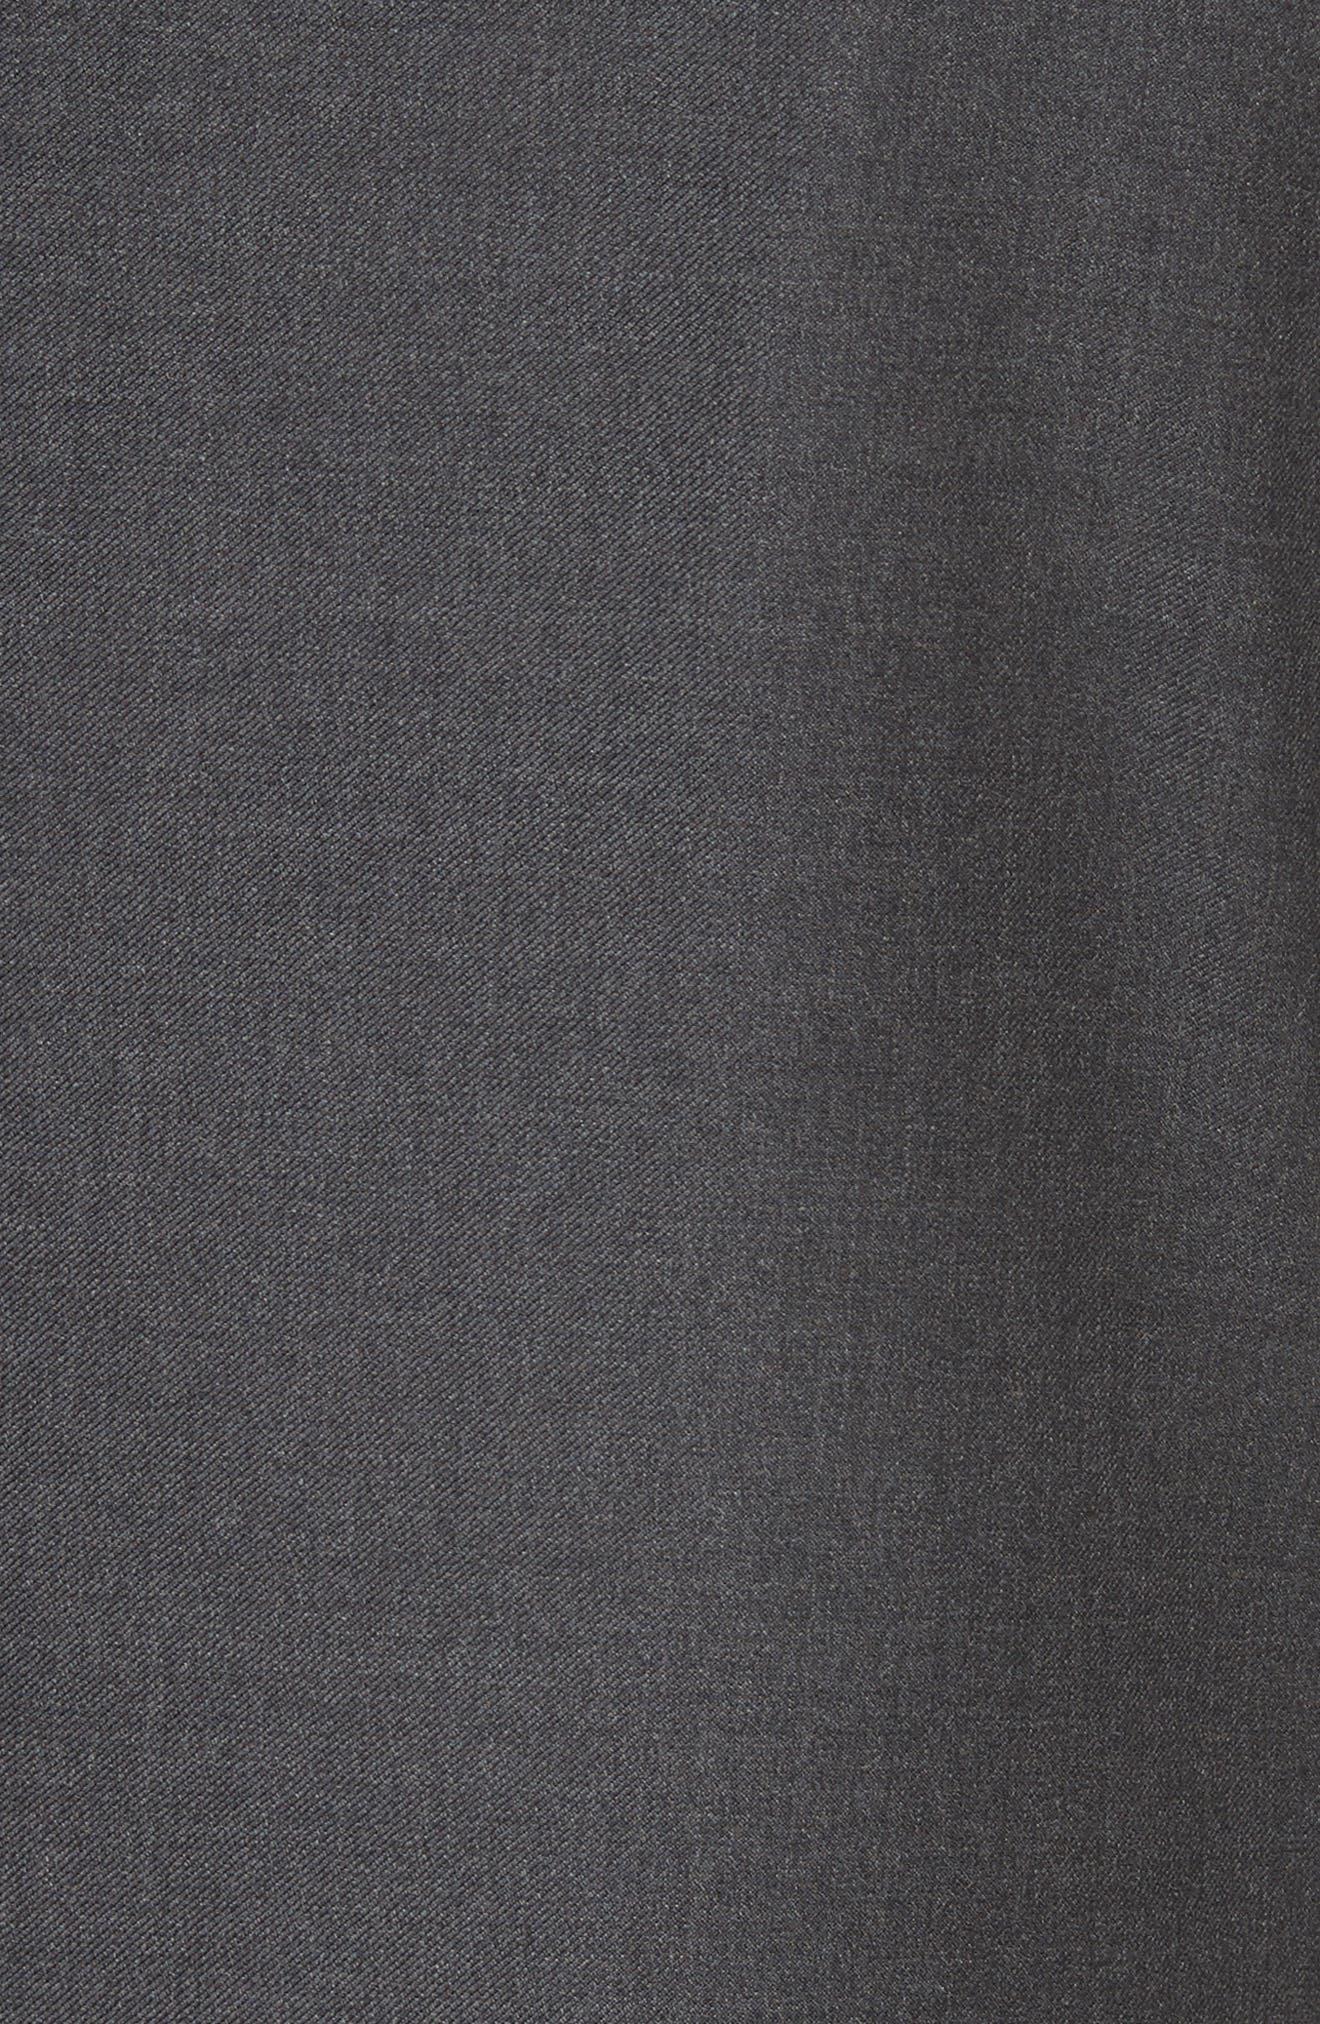 Trim Fit Solid Wool Suit,                             Alternate thumbnail 7, color,                             Grey